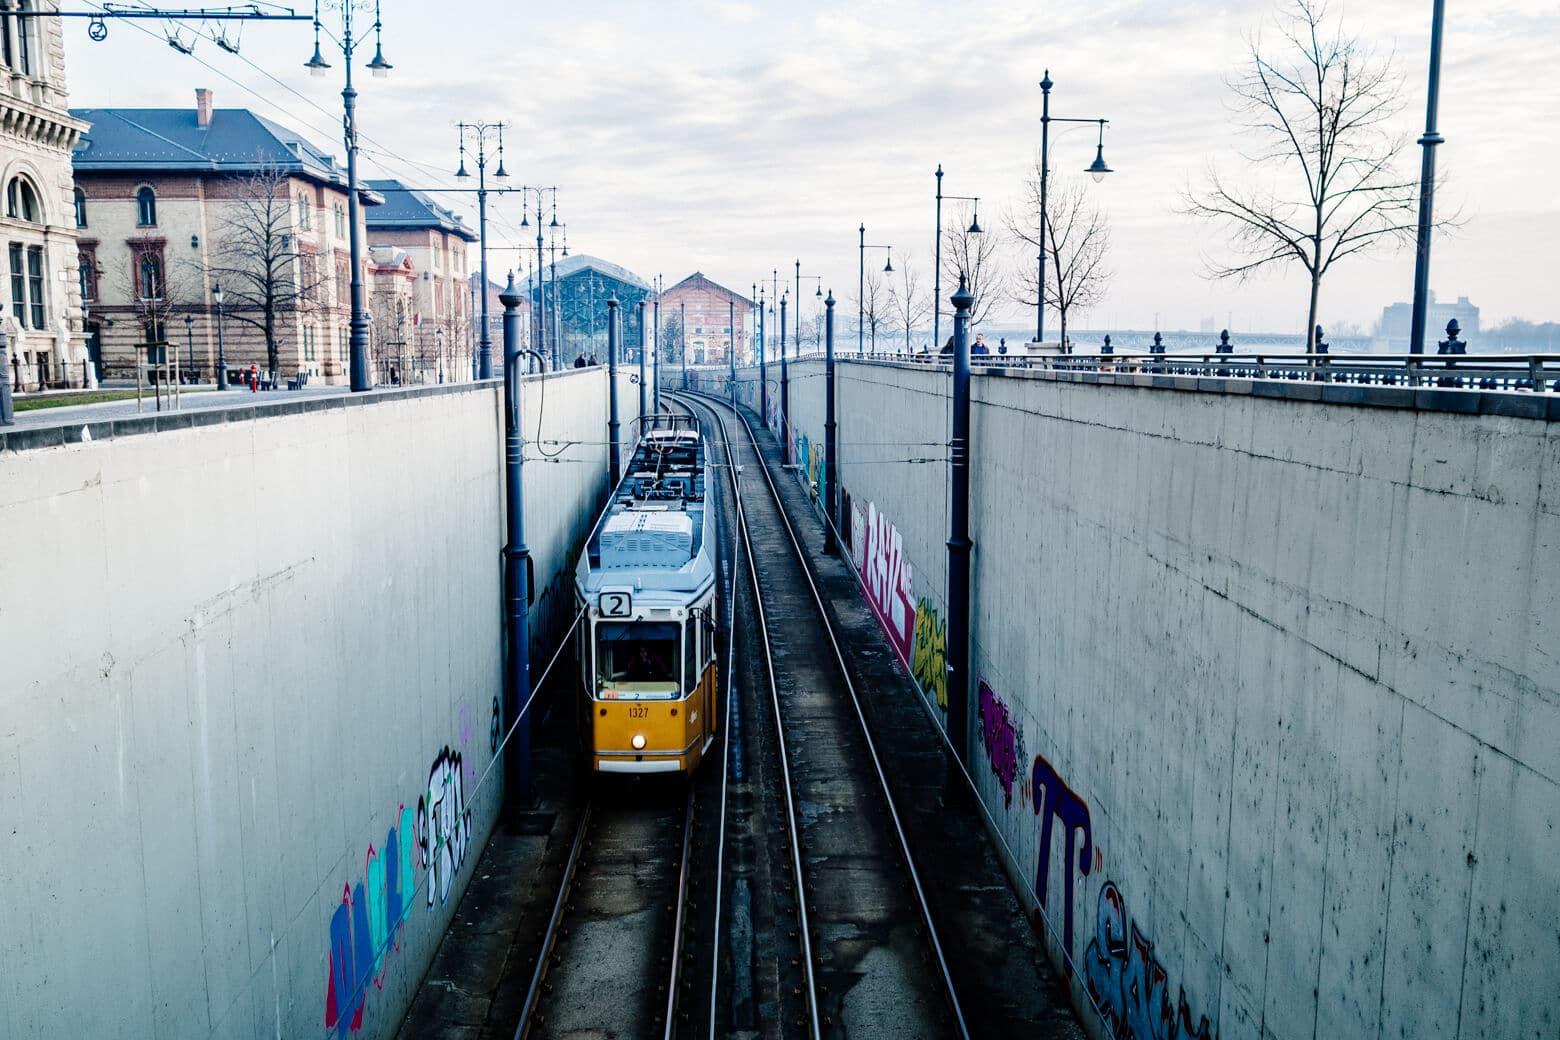 Budapest's #2 Tram